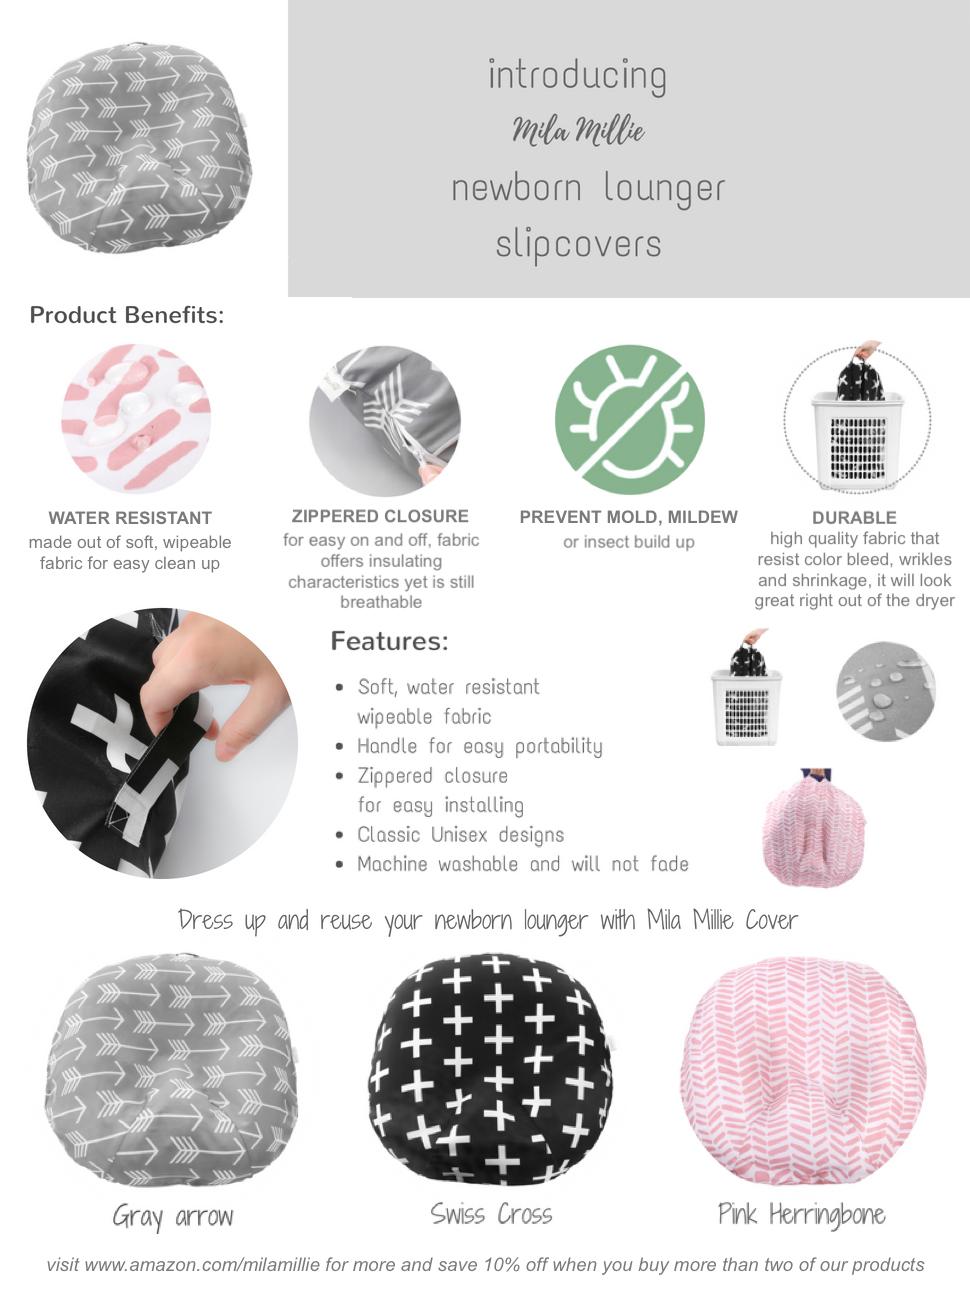 Mila Millie Newborn Lounger Arrow Nordic Swiss Pink Herringbone Water Resistant Removable Cover